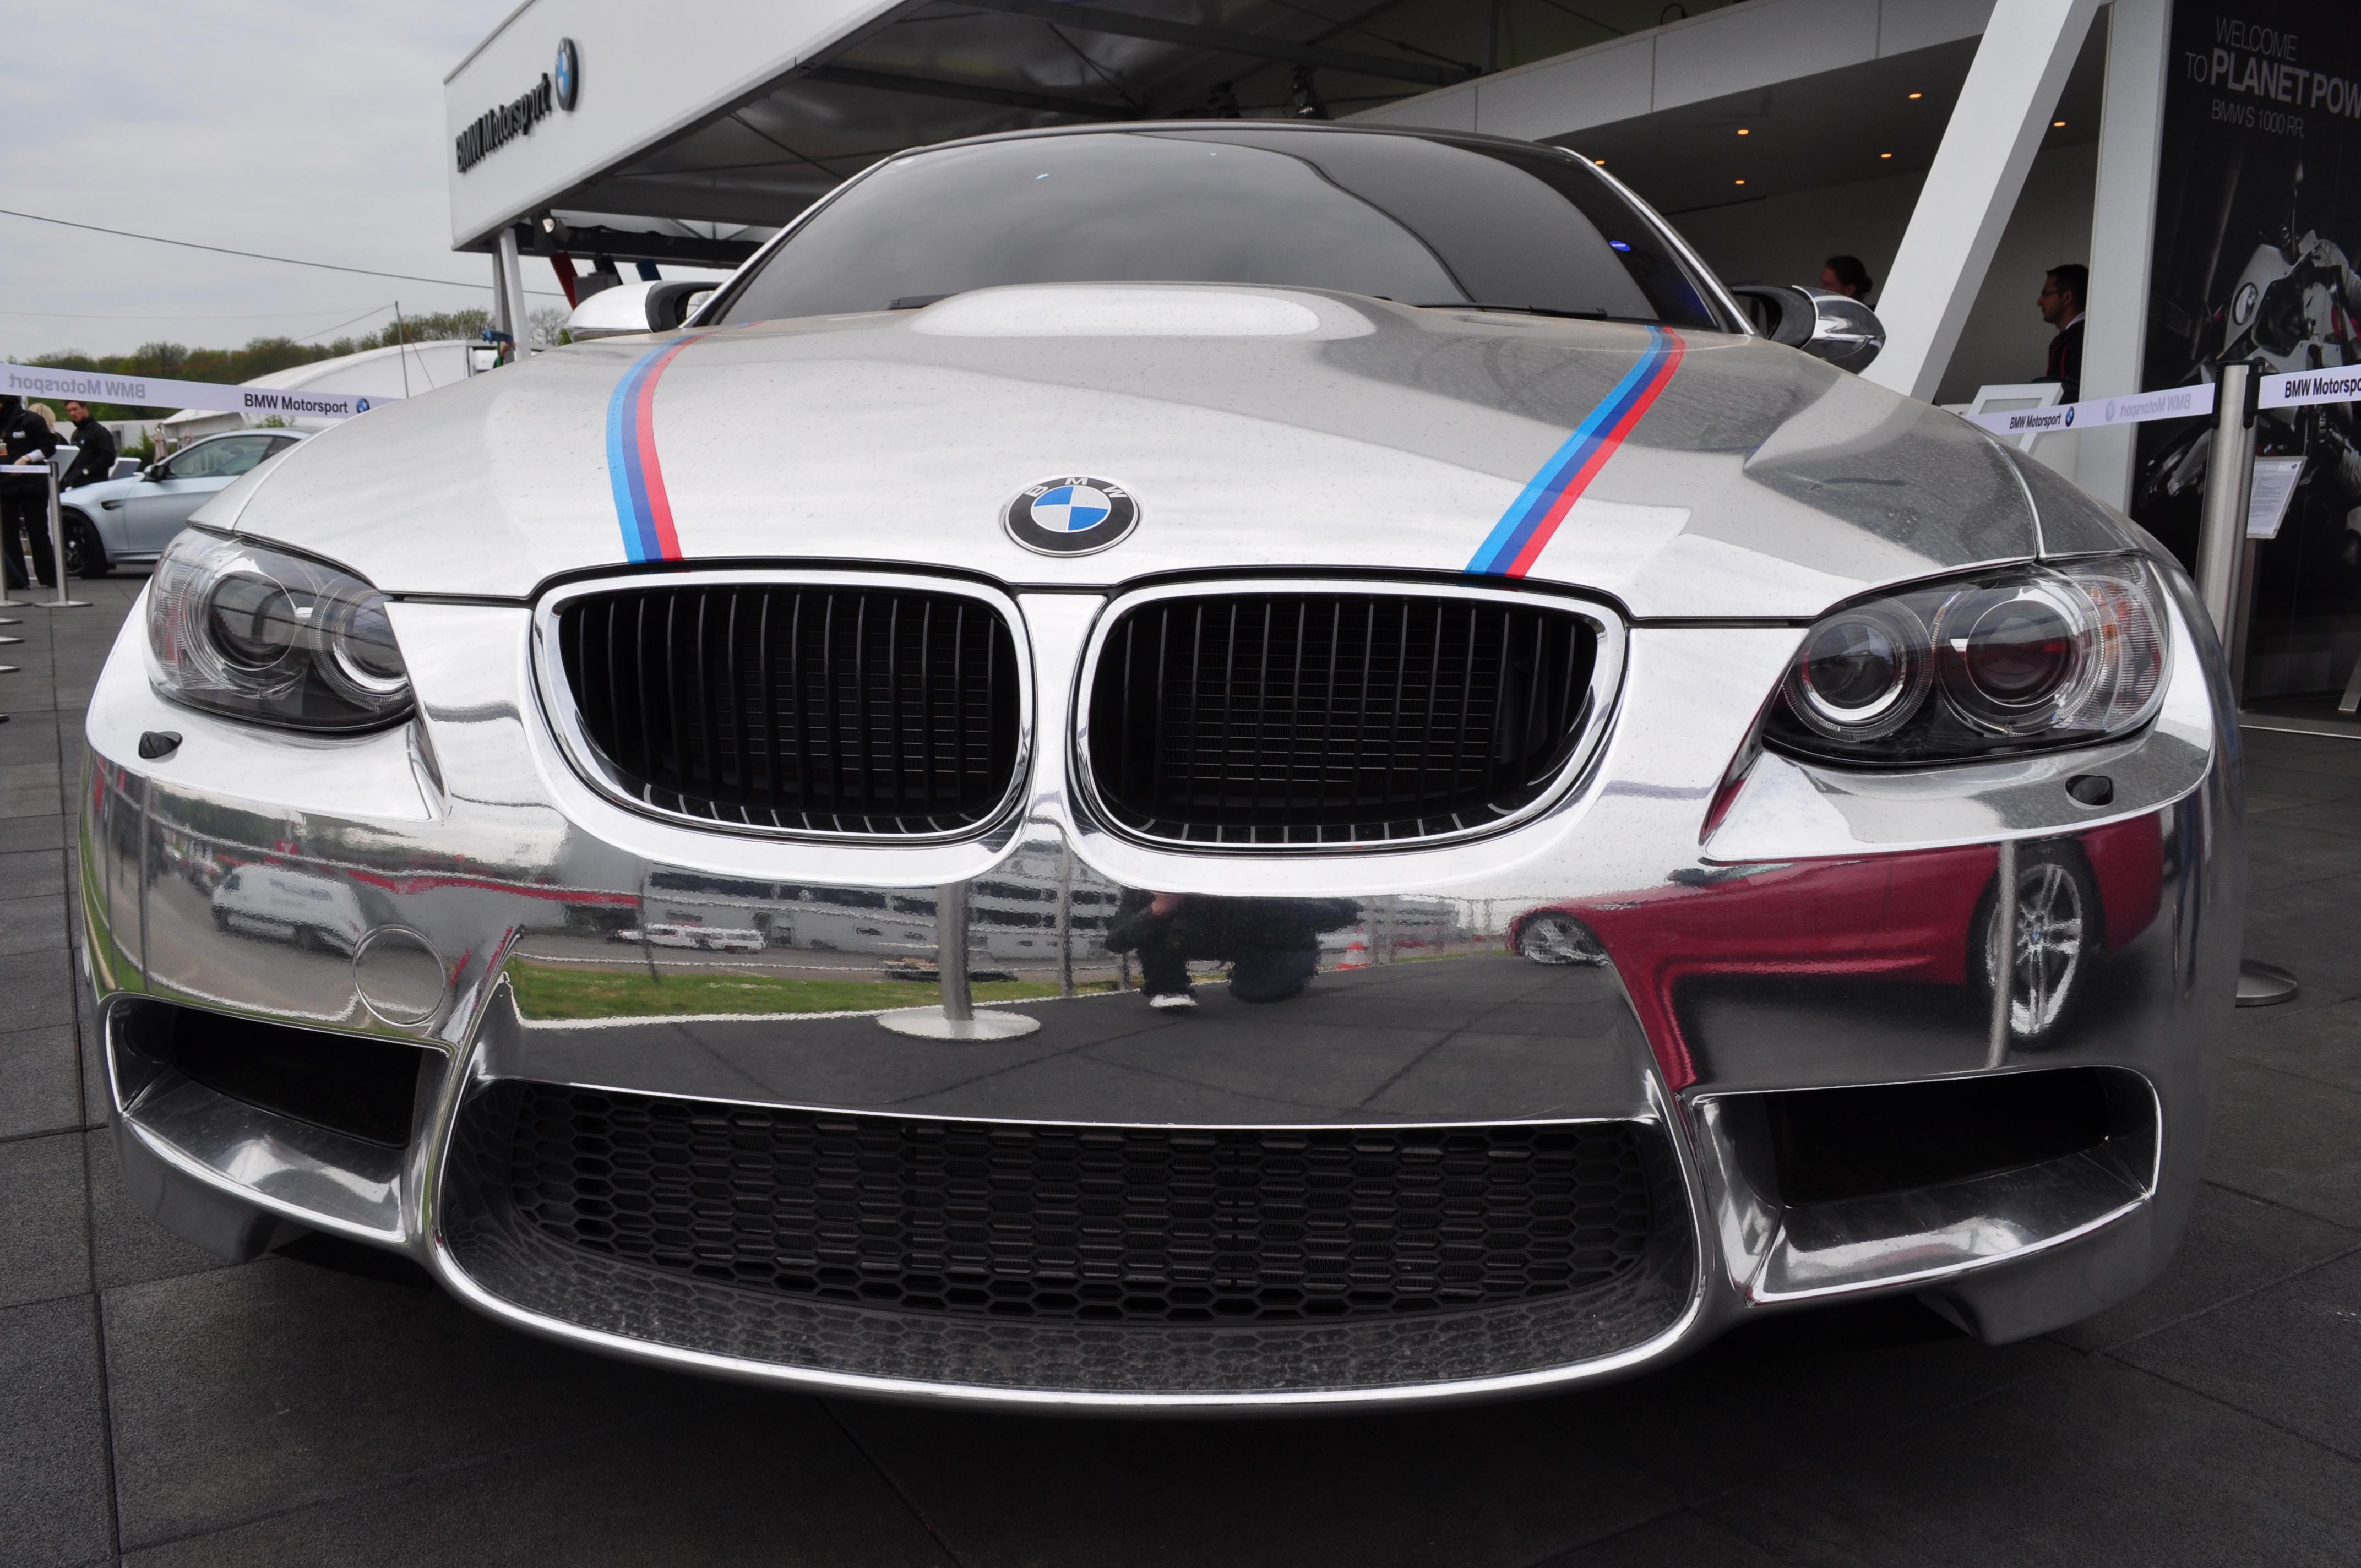 File:Chrome BMW M3 (7232698738).jpg - Wikimedia Commons